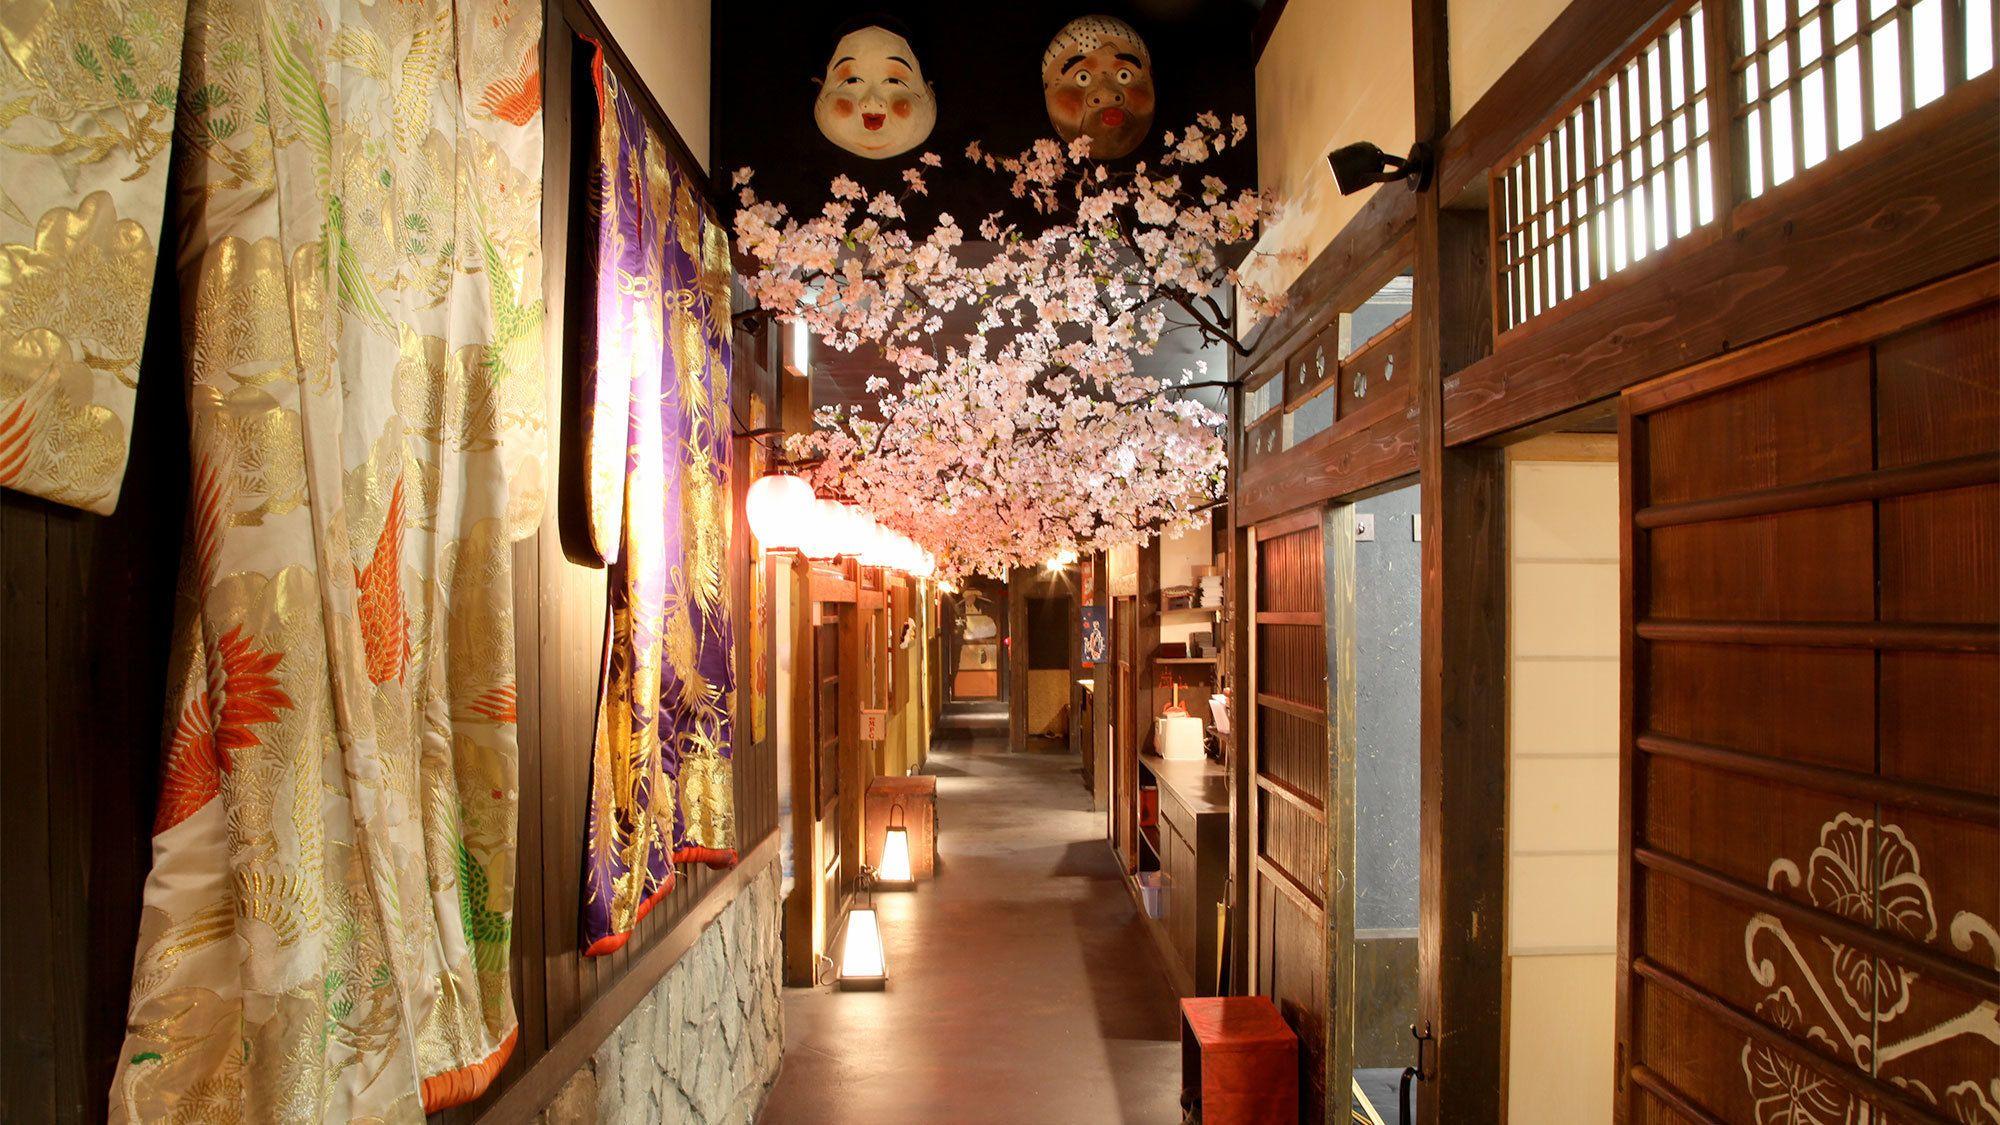 Robotshow og Izakaya middag på en restaurant i Koyotostil